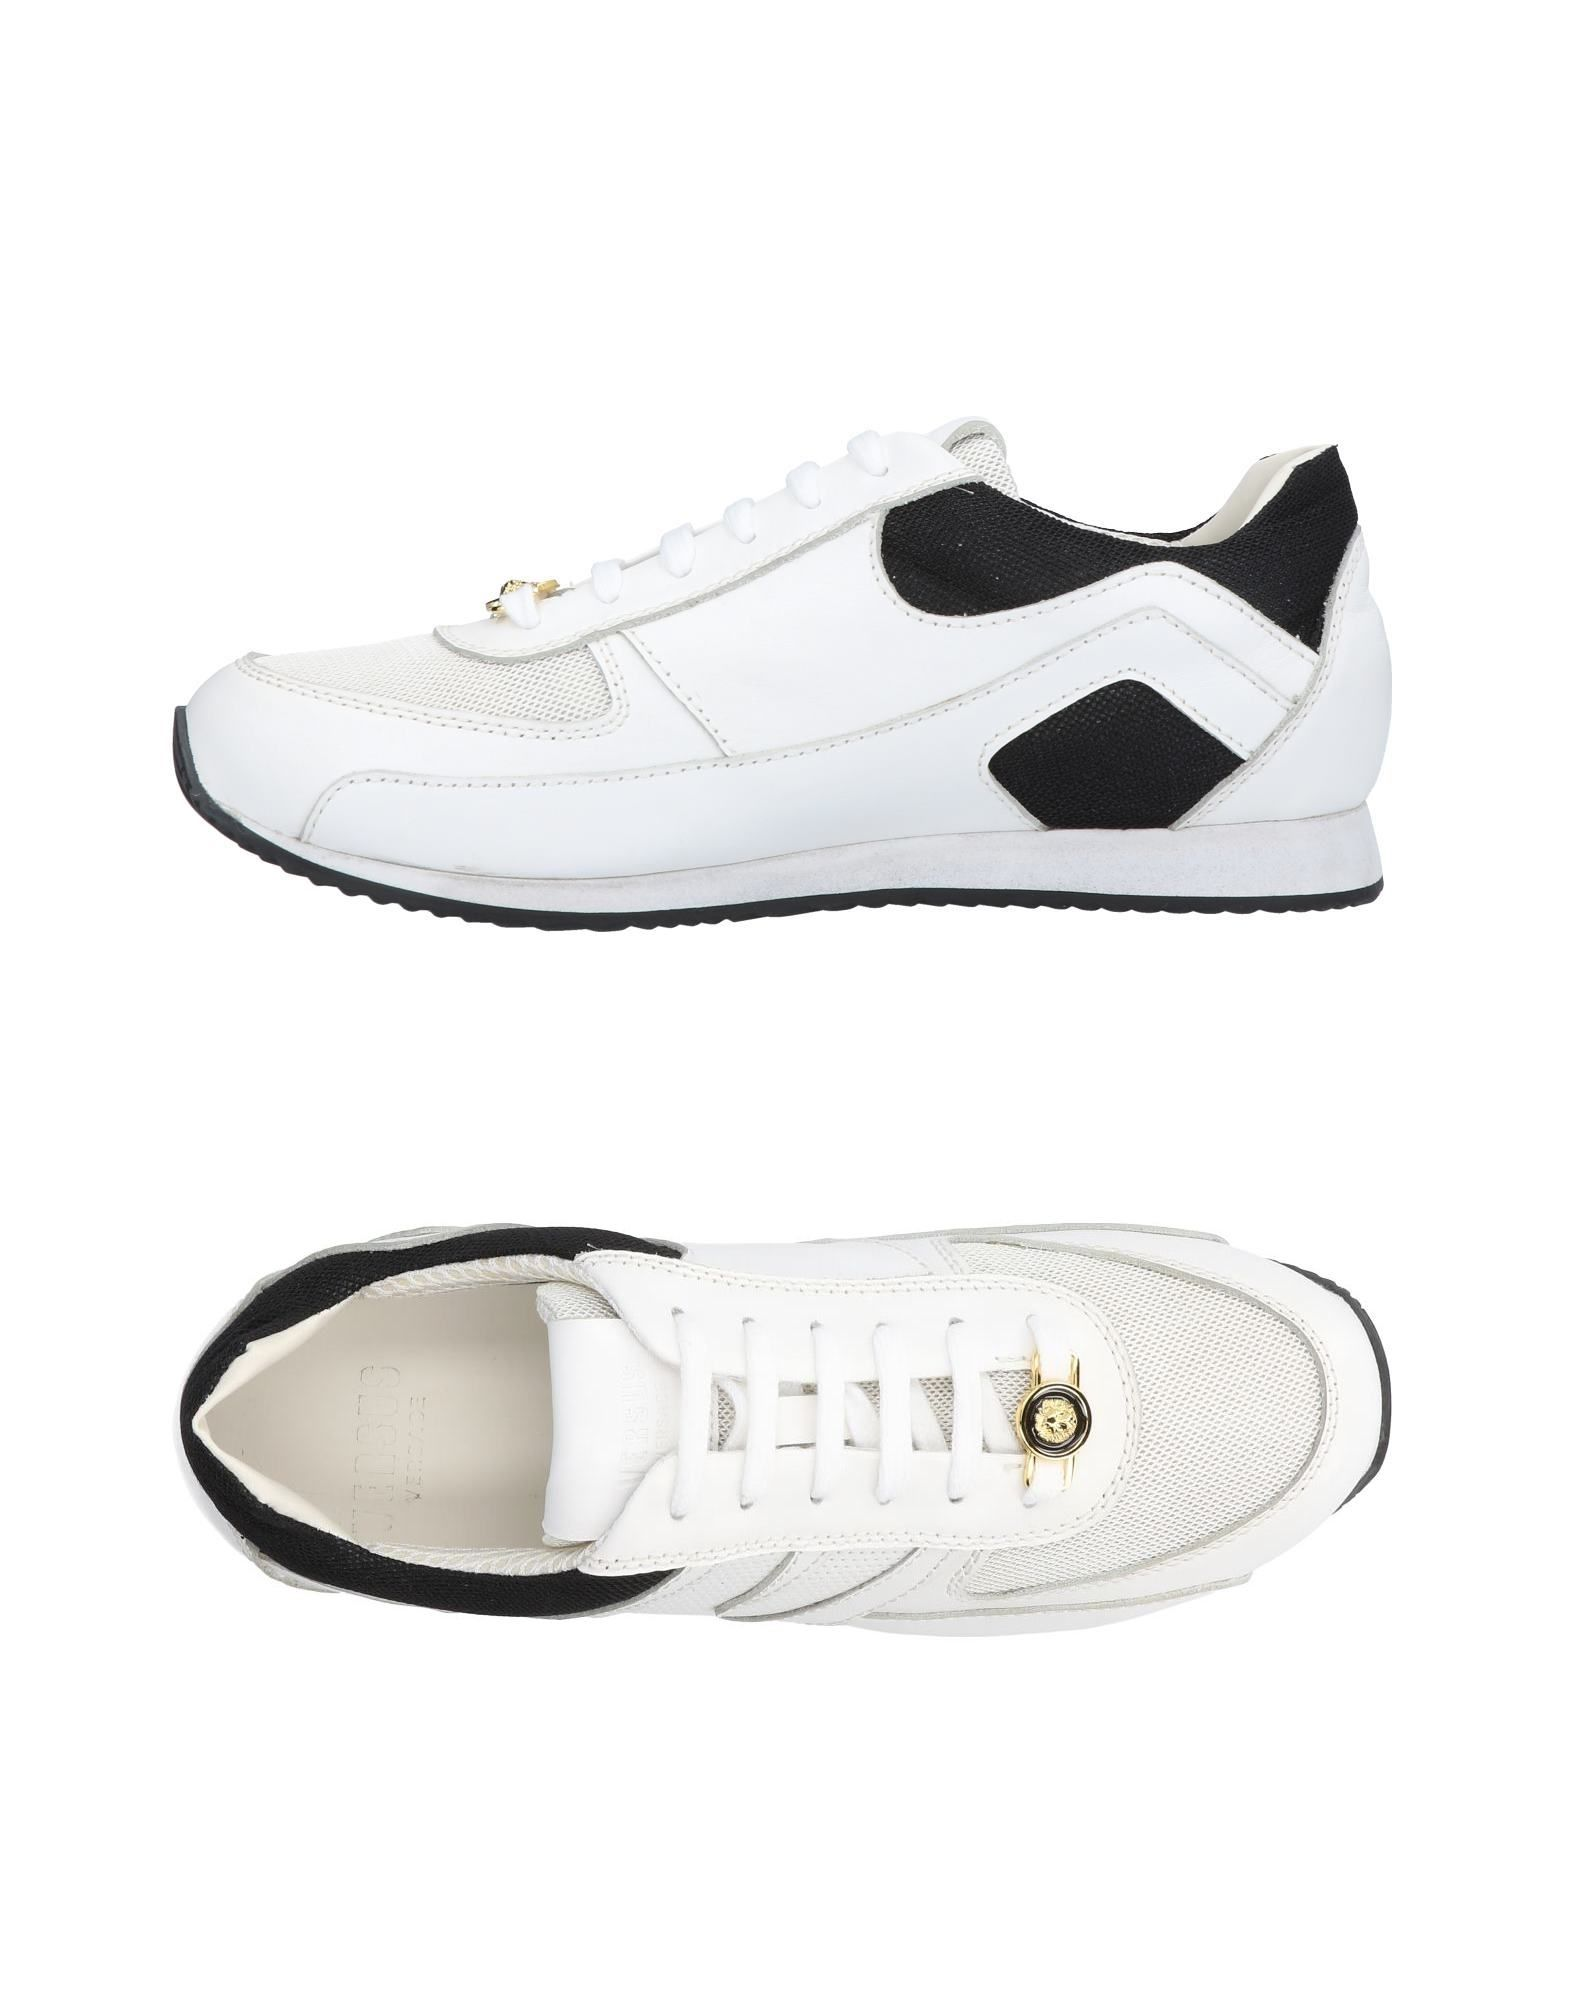 Versus Versace Versace Versace Sneakers - Men Versus Versace Sneakers online on  United Kingdom - 11421602AQ 8f6496